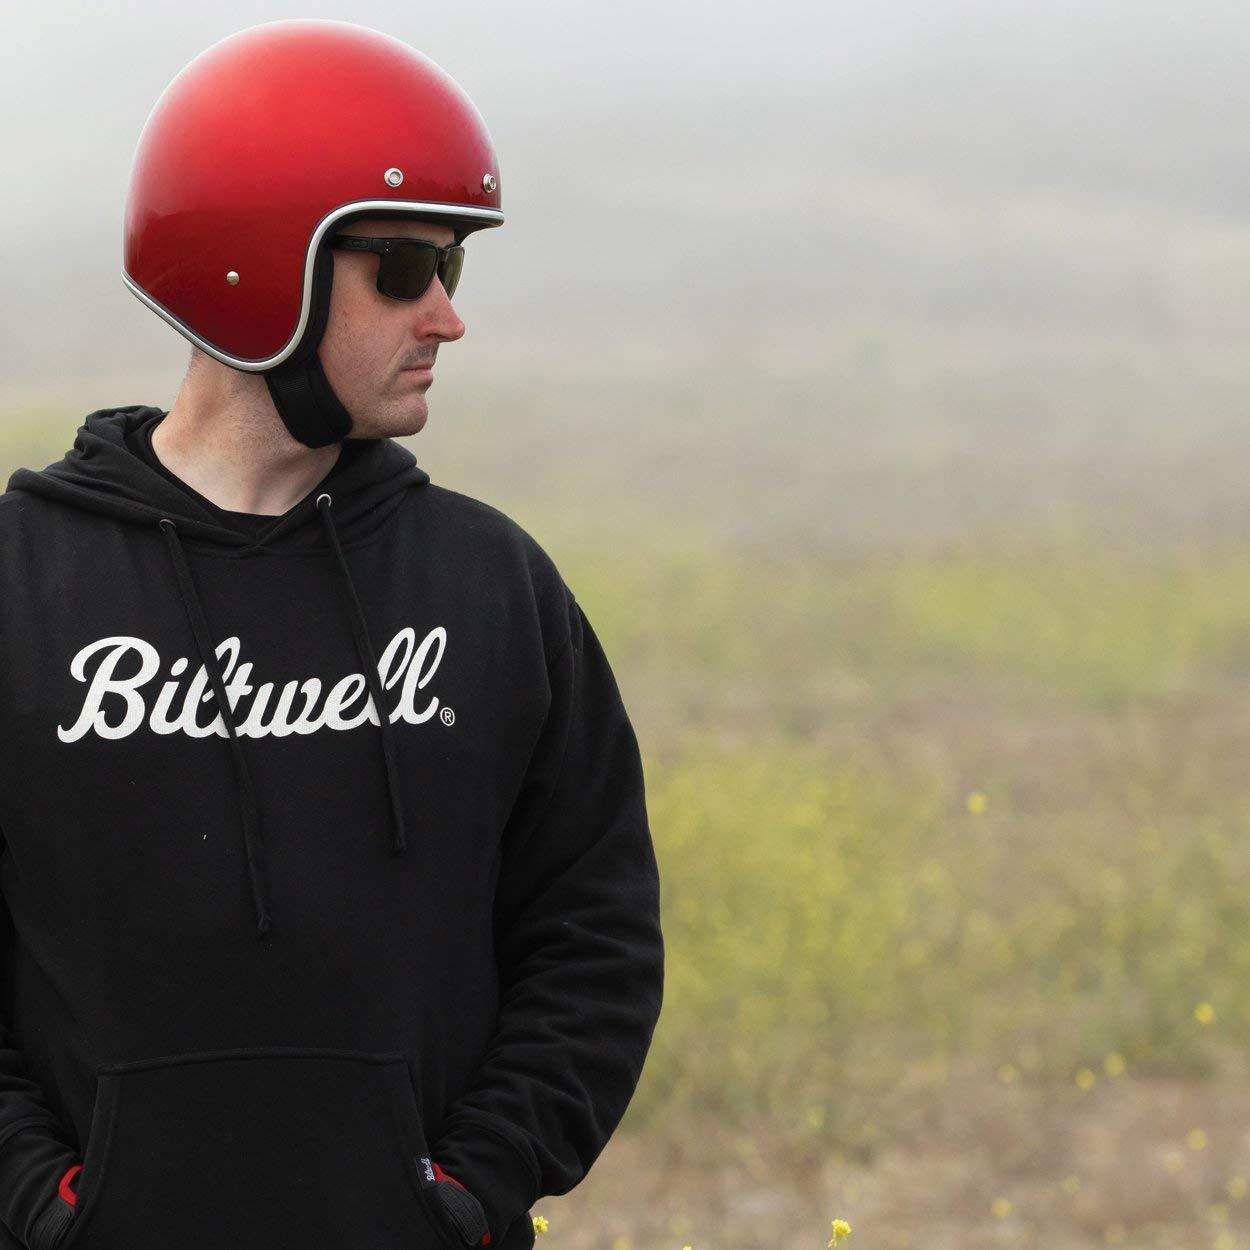 Casco Jet Aperto Biltwell Bonanza Rosso Metallic Candy Red Approvato DOT Helmet Biker Look Stile Universale x Genere Custom Vintage retr/ò Anni 70 off-Road Street Taglia L